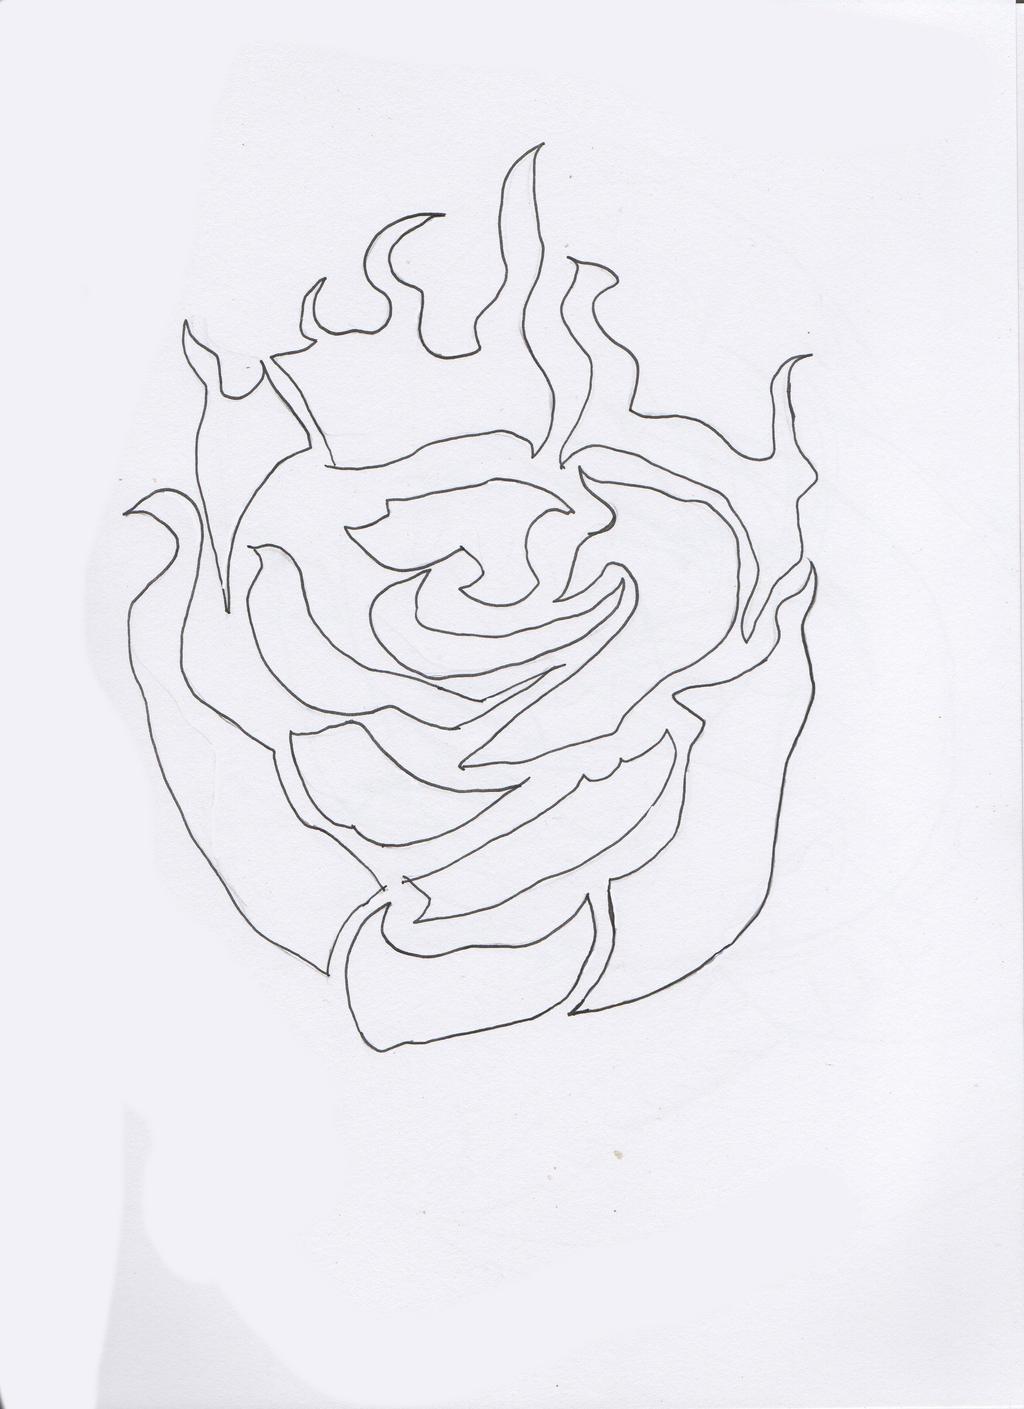 Rose (Ruby Rose) Symbol attempt by lienora on DeviantArt